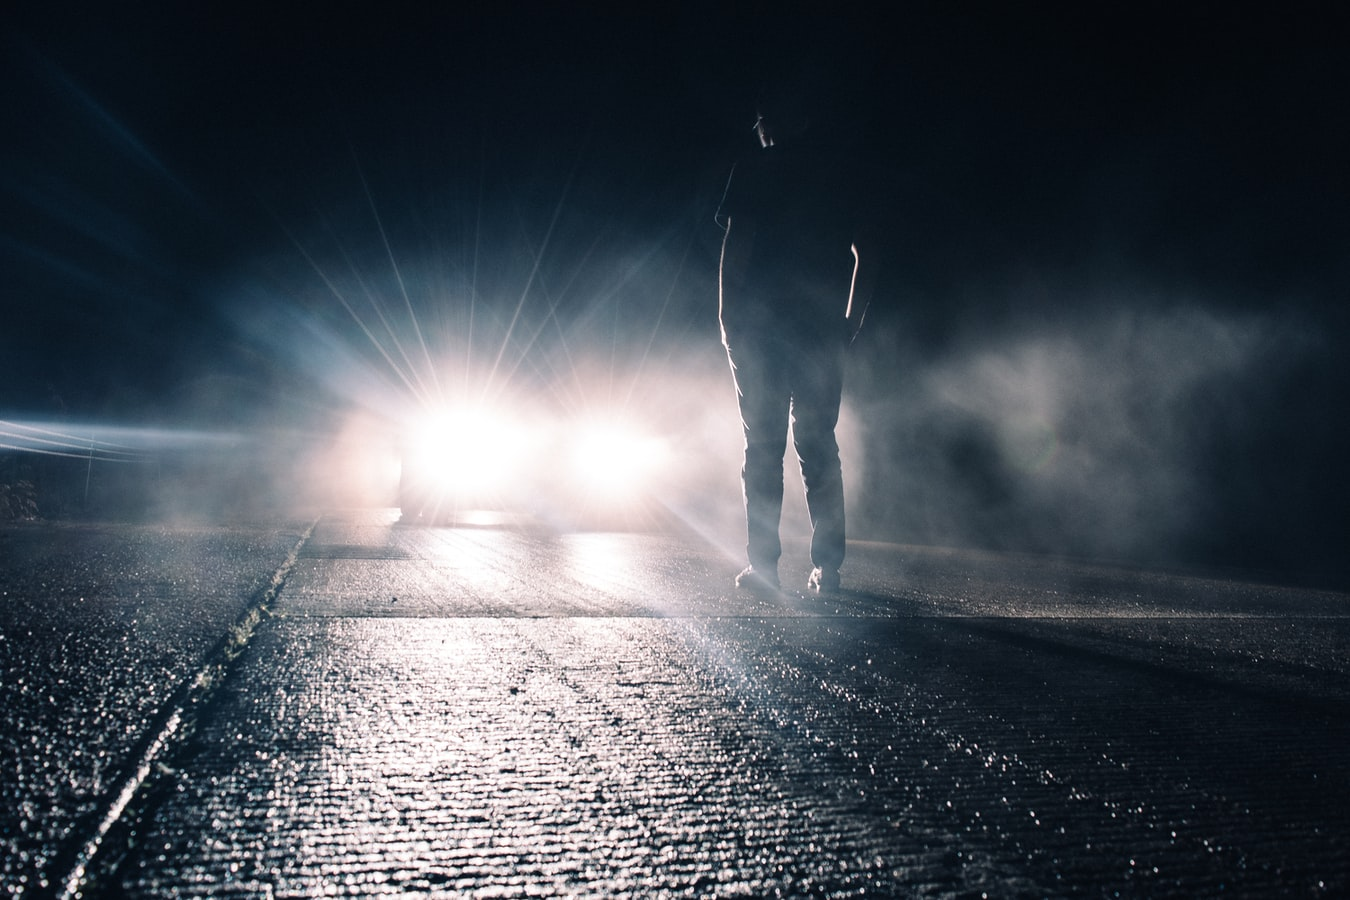 beaverton auto accident dangerous intersection